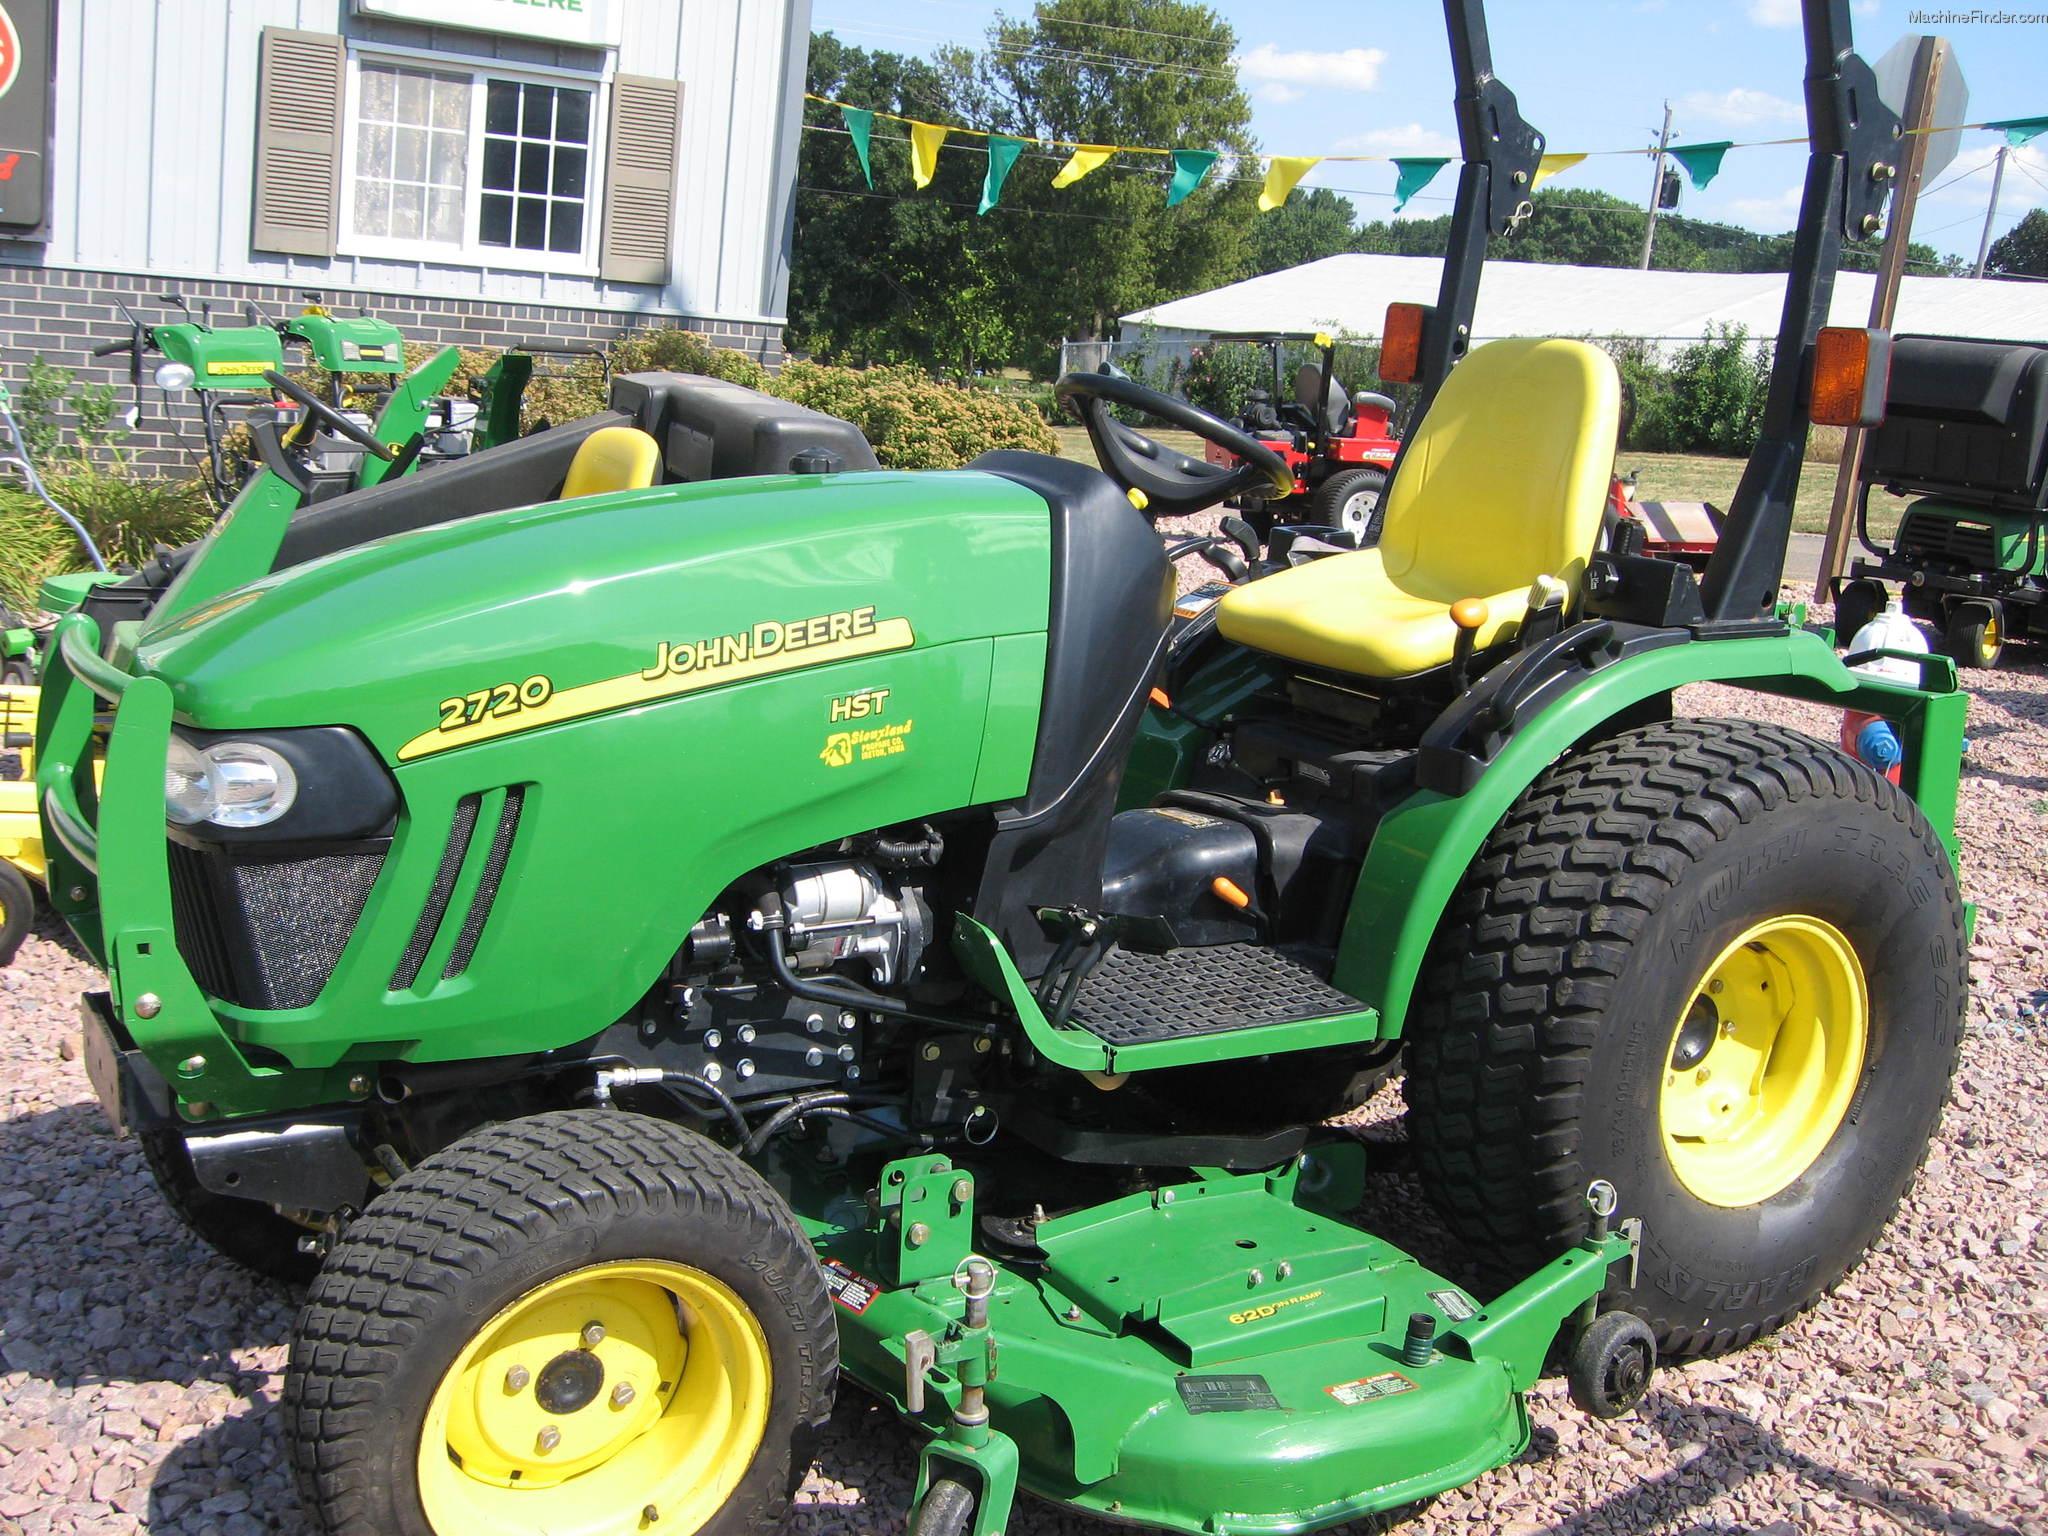 2009 John Deere 2720 Tractors - Compact (1-40hp.) - John ...